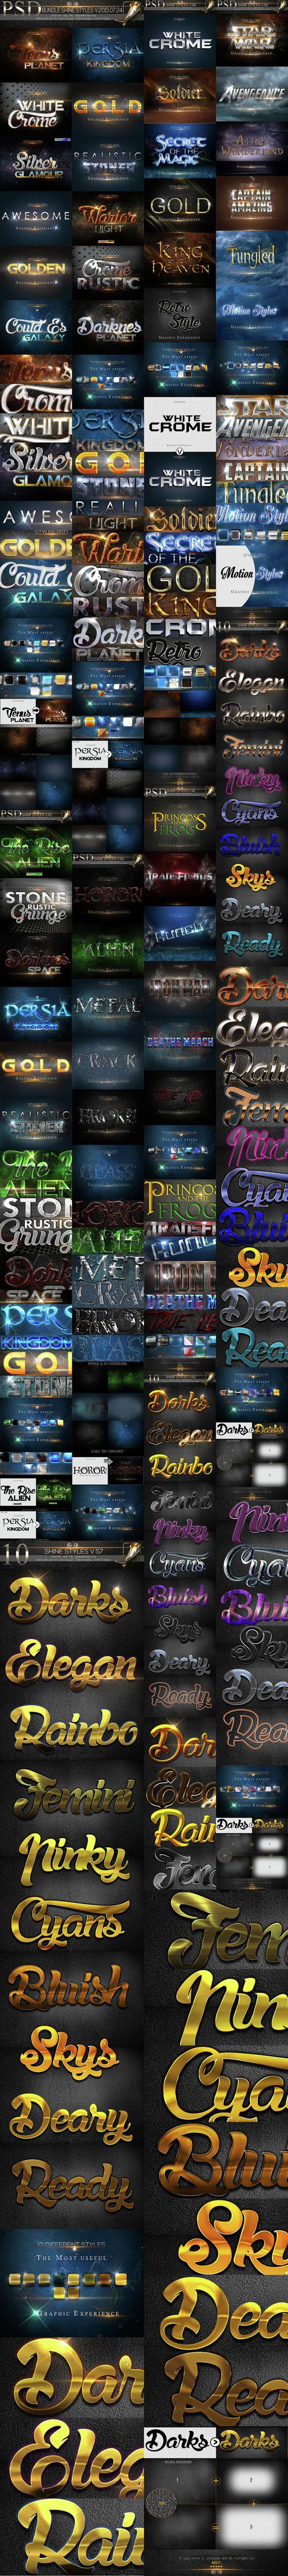 50 Bundle Text Style #styles #unique #text effects • Download ➝ https://graphicriver.net/item/50-bundle-text-style/14614939?ref=pxcr